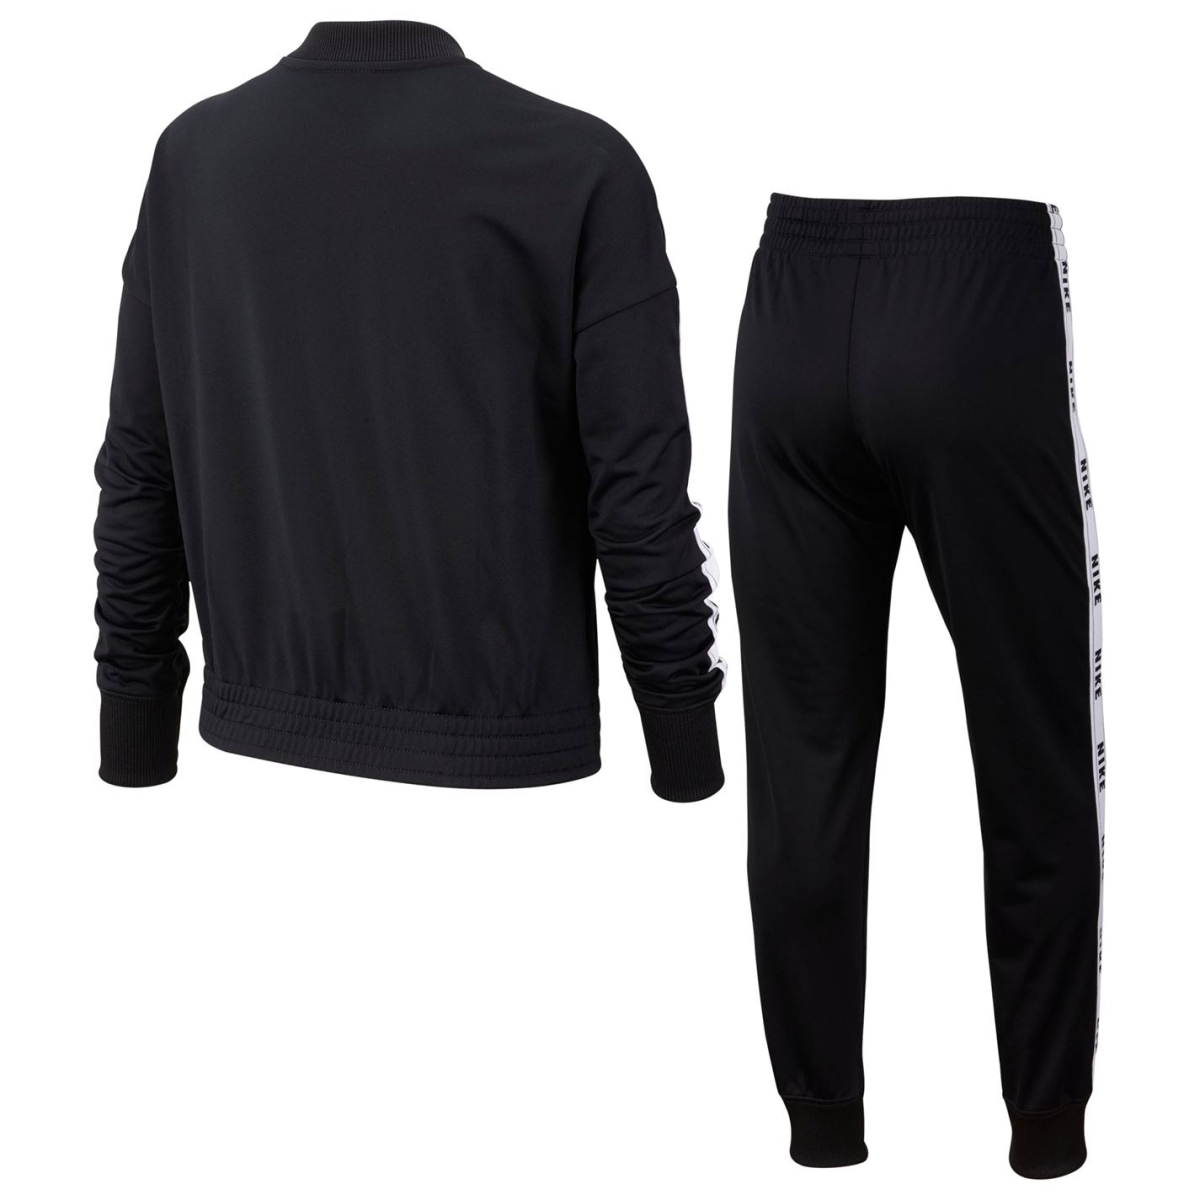 Nike Sportswear Trainingsanzug Sportanzug Kinder Mädchen 0506